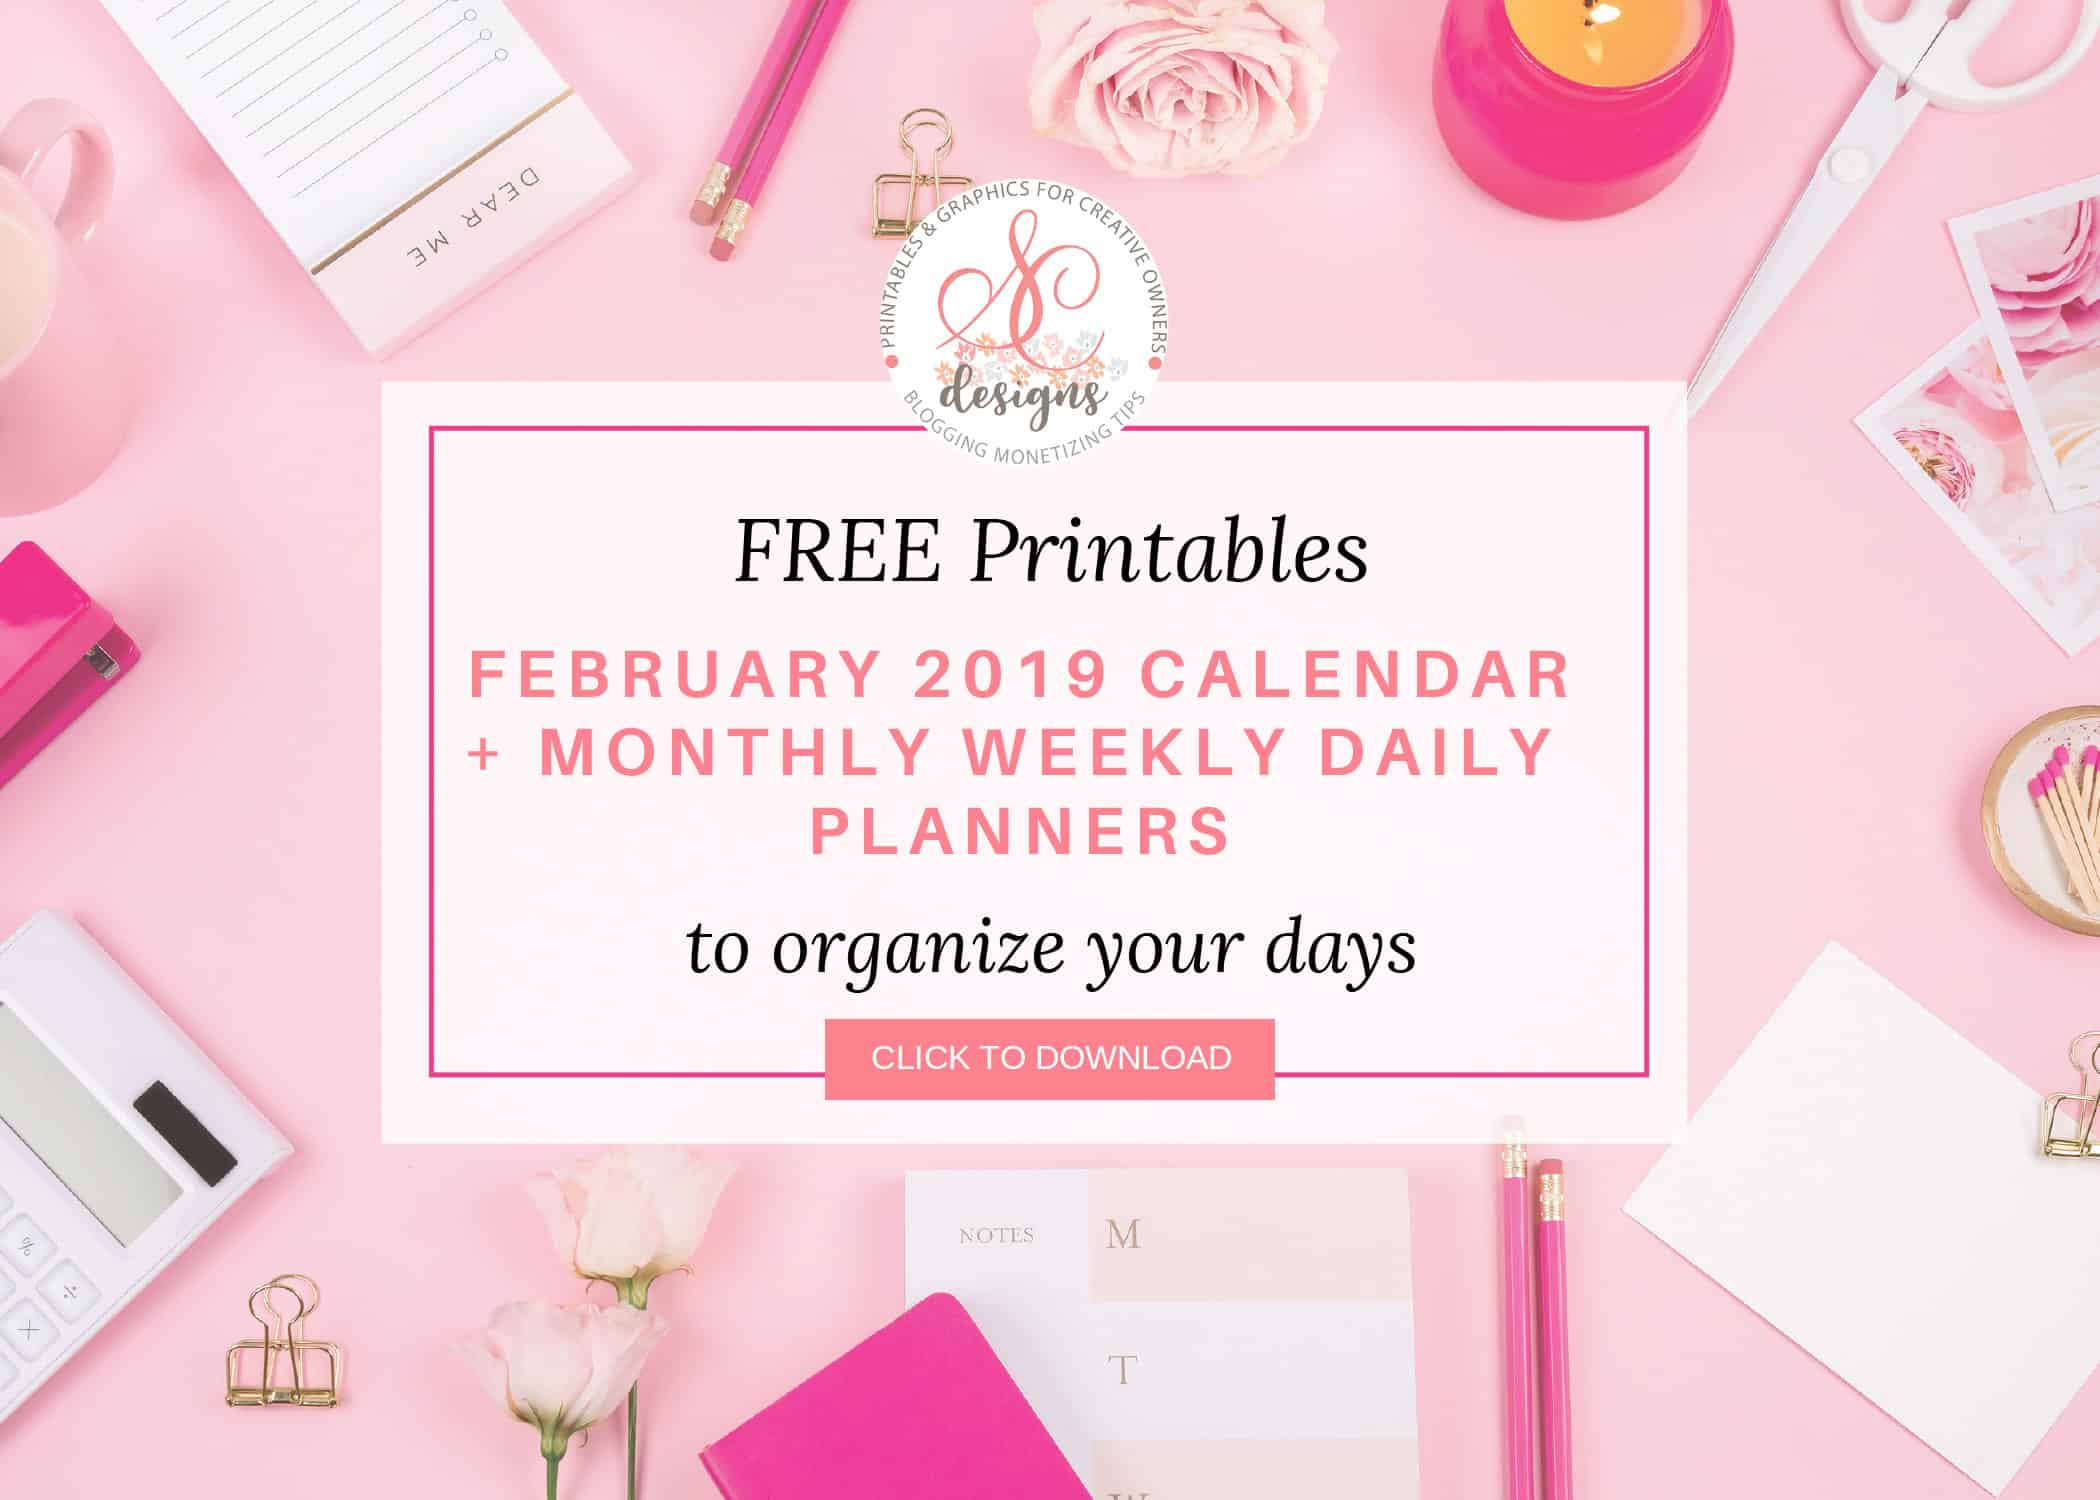 Free February 2019 Calendar Monthly Planner Printable #februaryplanner #freeprintable #freemonthlyplanner #freemonthlyplannerprintable #weeklyplannerprintable #dailyplannerprintable